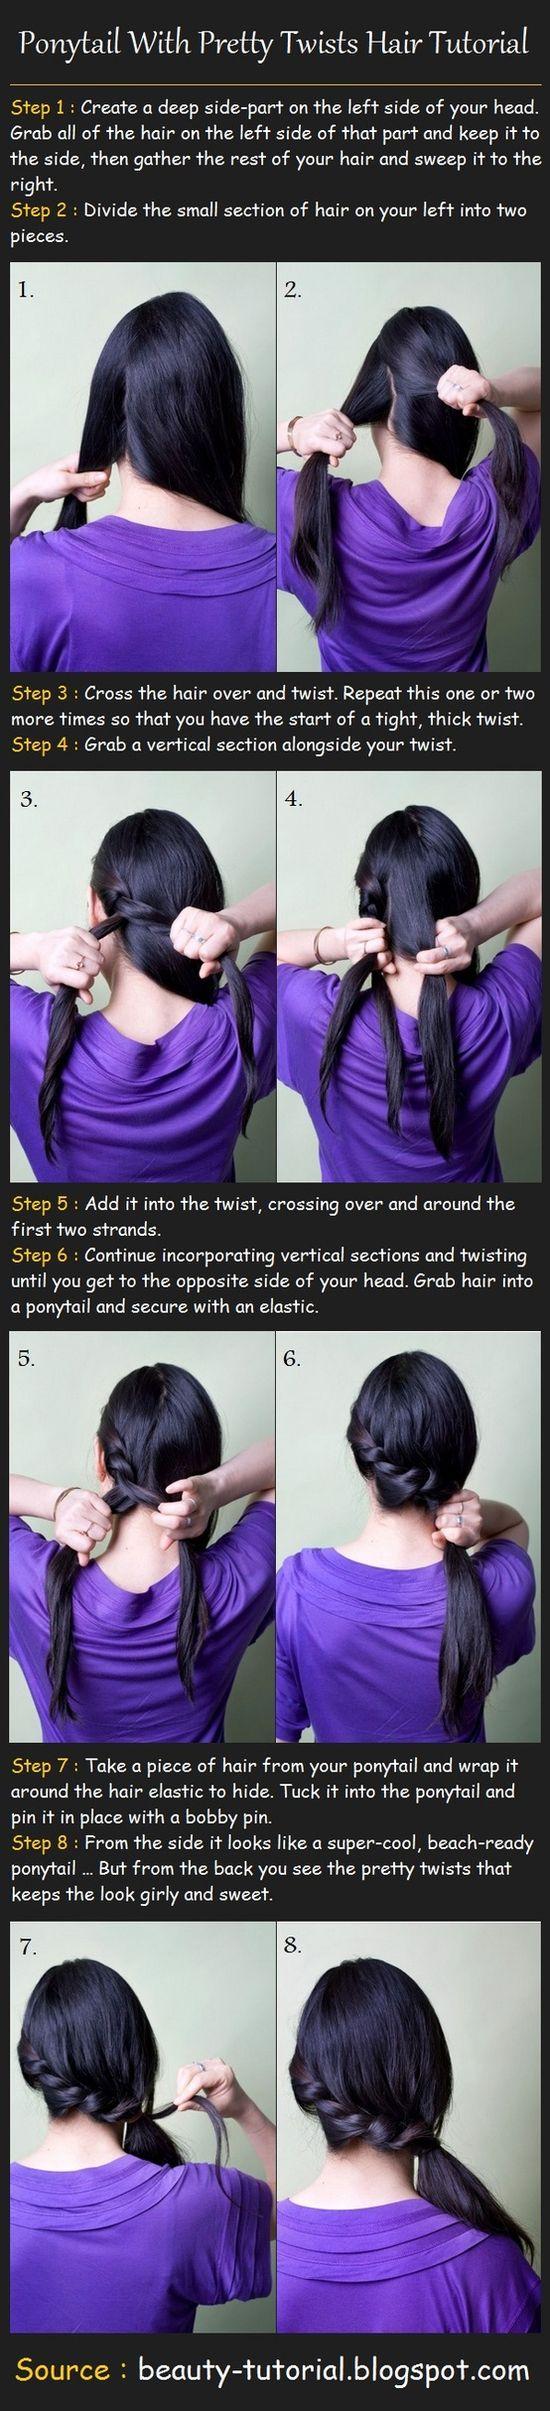 ponytail with a twist